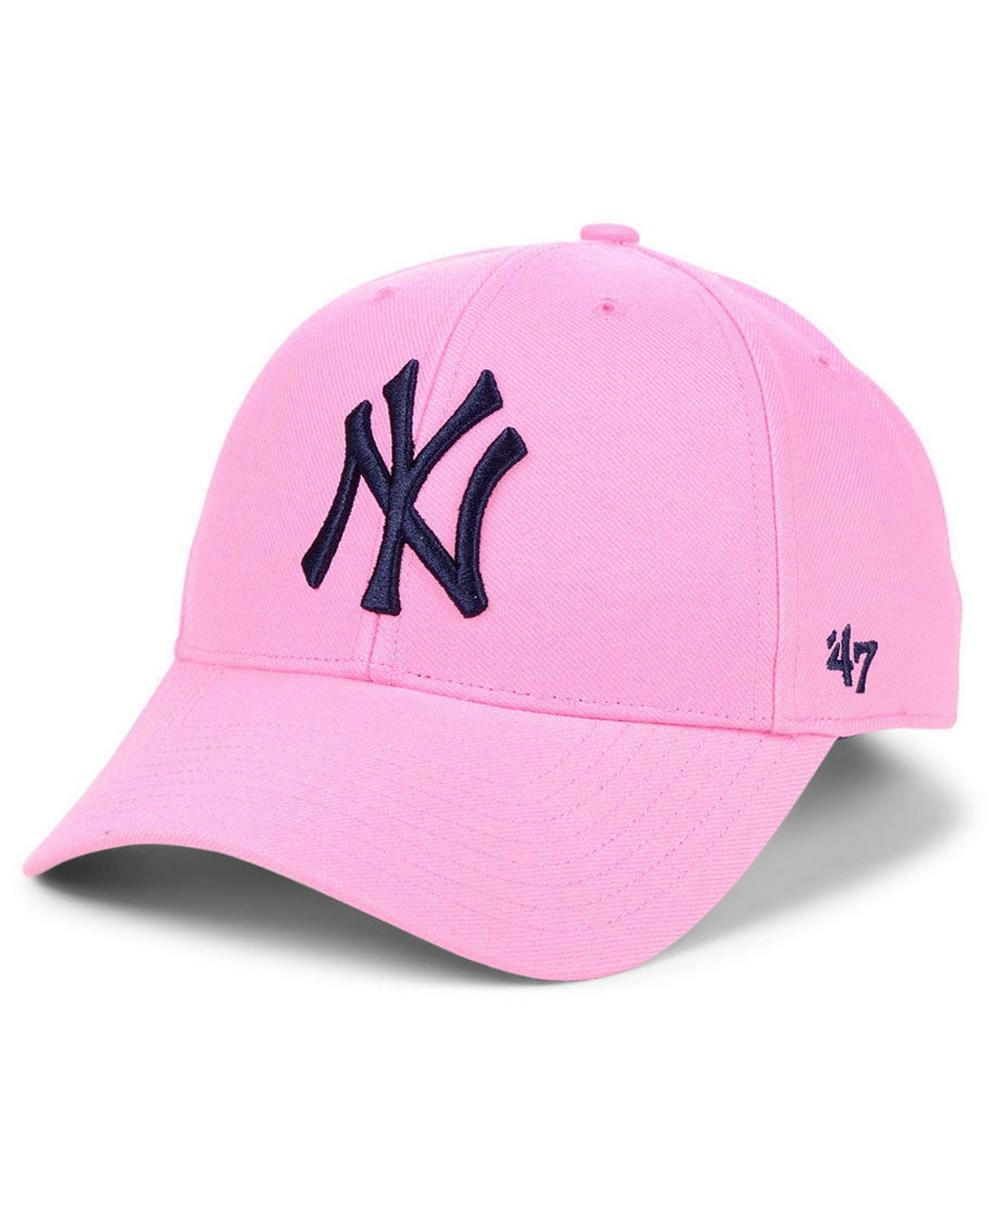 New Era 47 Brand New York Yankees Pink Series Cap Reviews Sports Fan Shop By Lids Men Macy S 47 Brand Ny Cap New Era